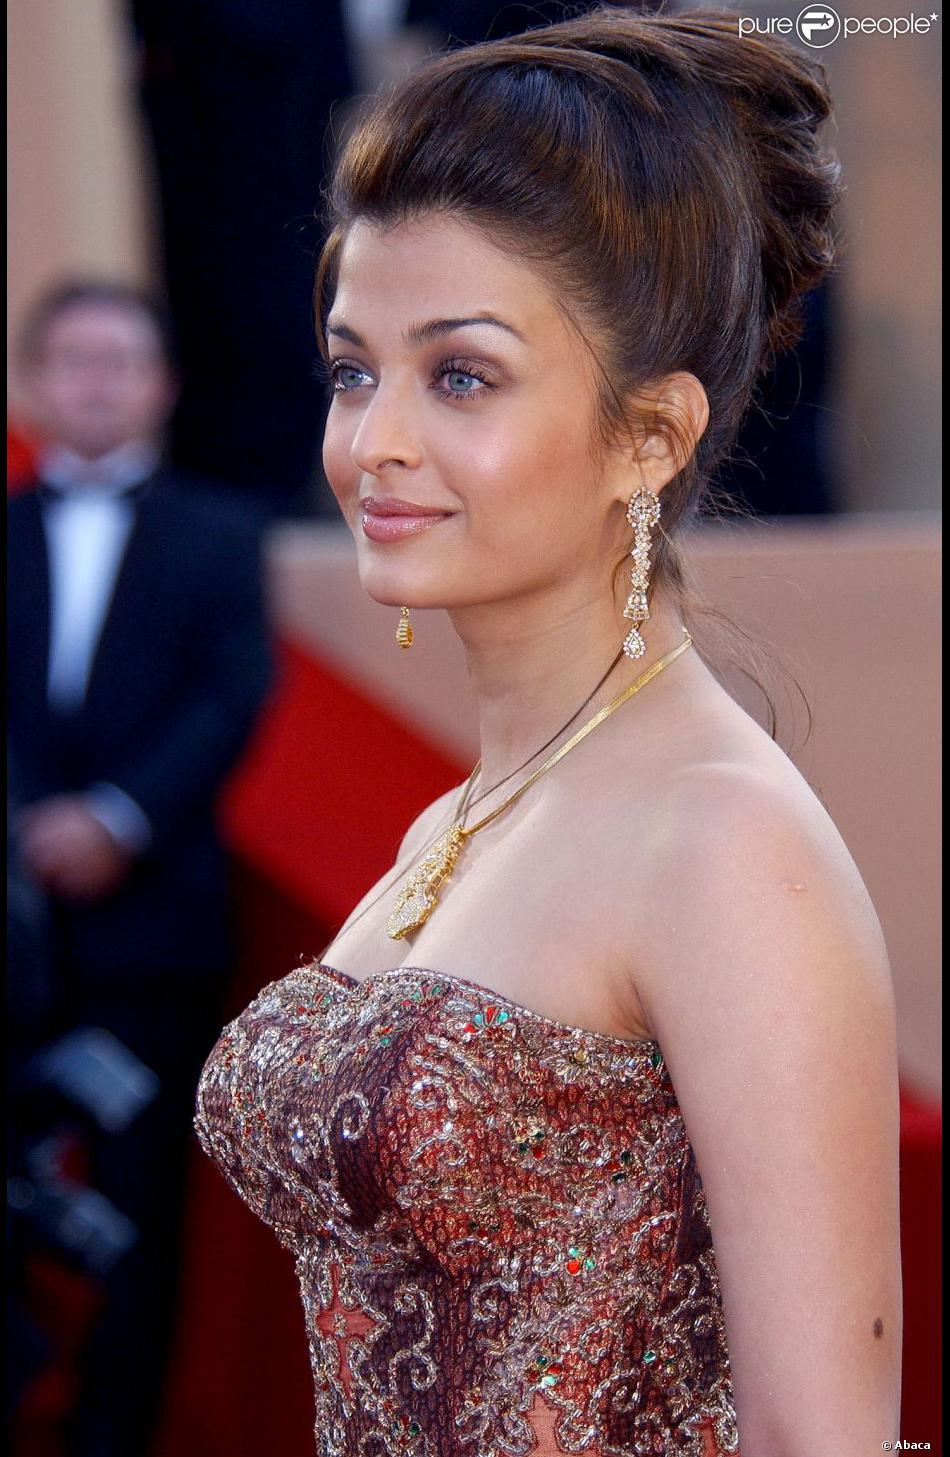 Aishwarya Rai 2003 Aishwarya Rai Membre du Jury